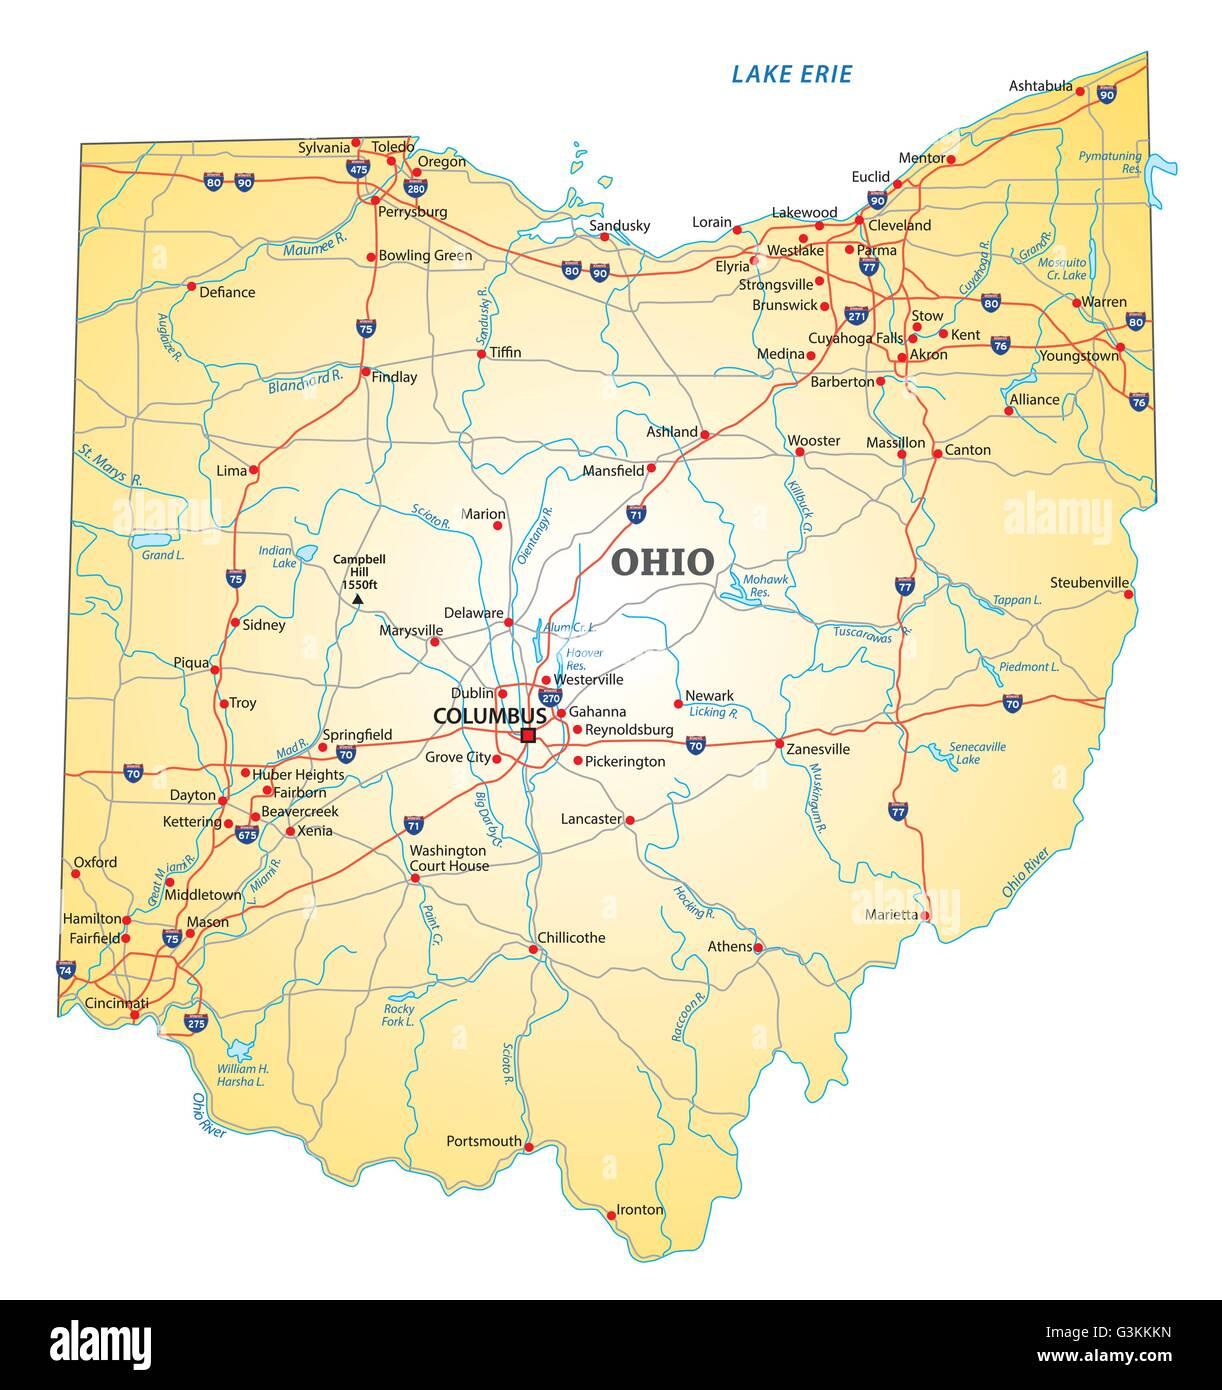 Ohio River Map Stockfotos & Ohio River Map Bilder - Alamy